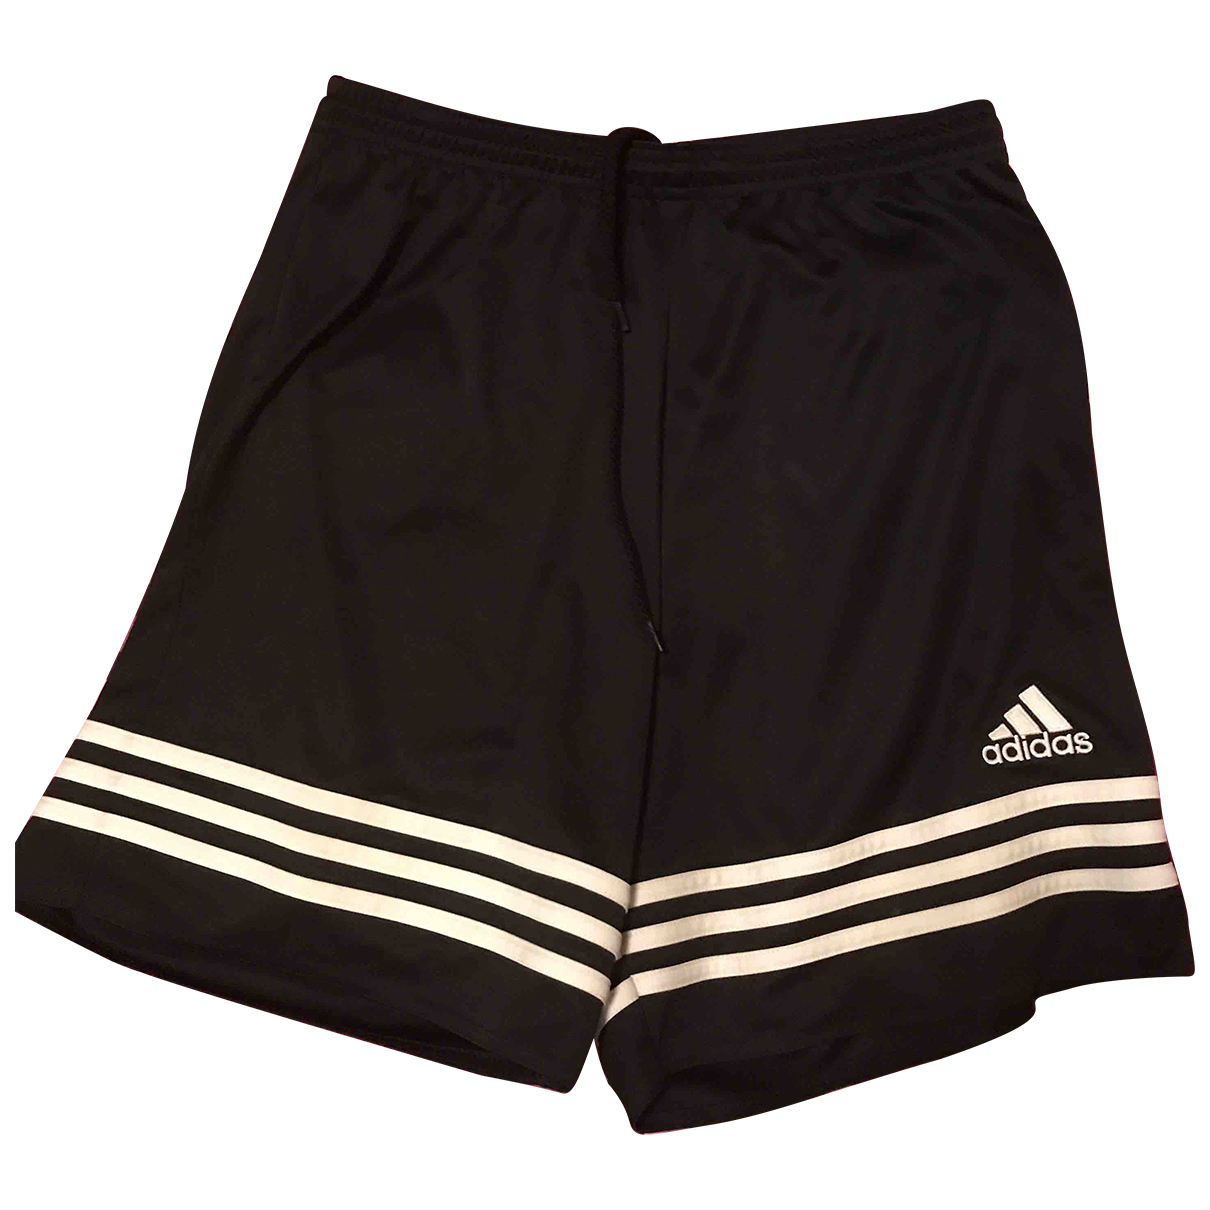 Adidas \N Shorts in  Schwarz Polyester